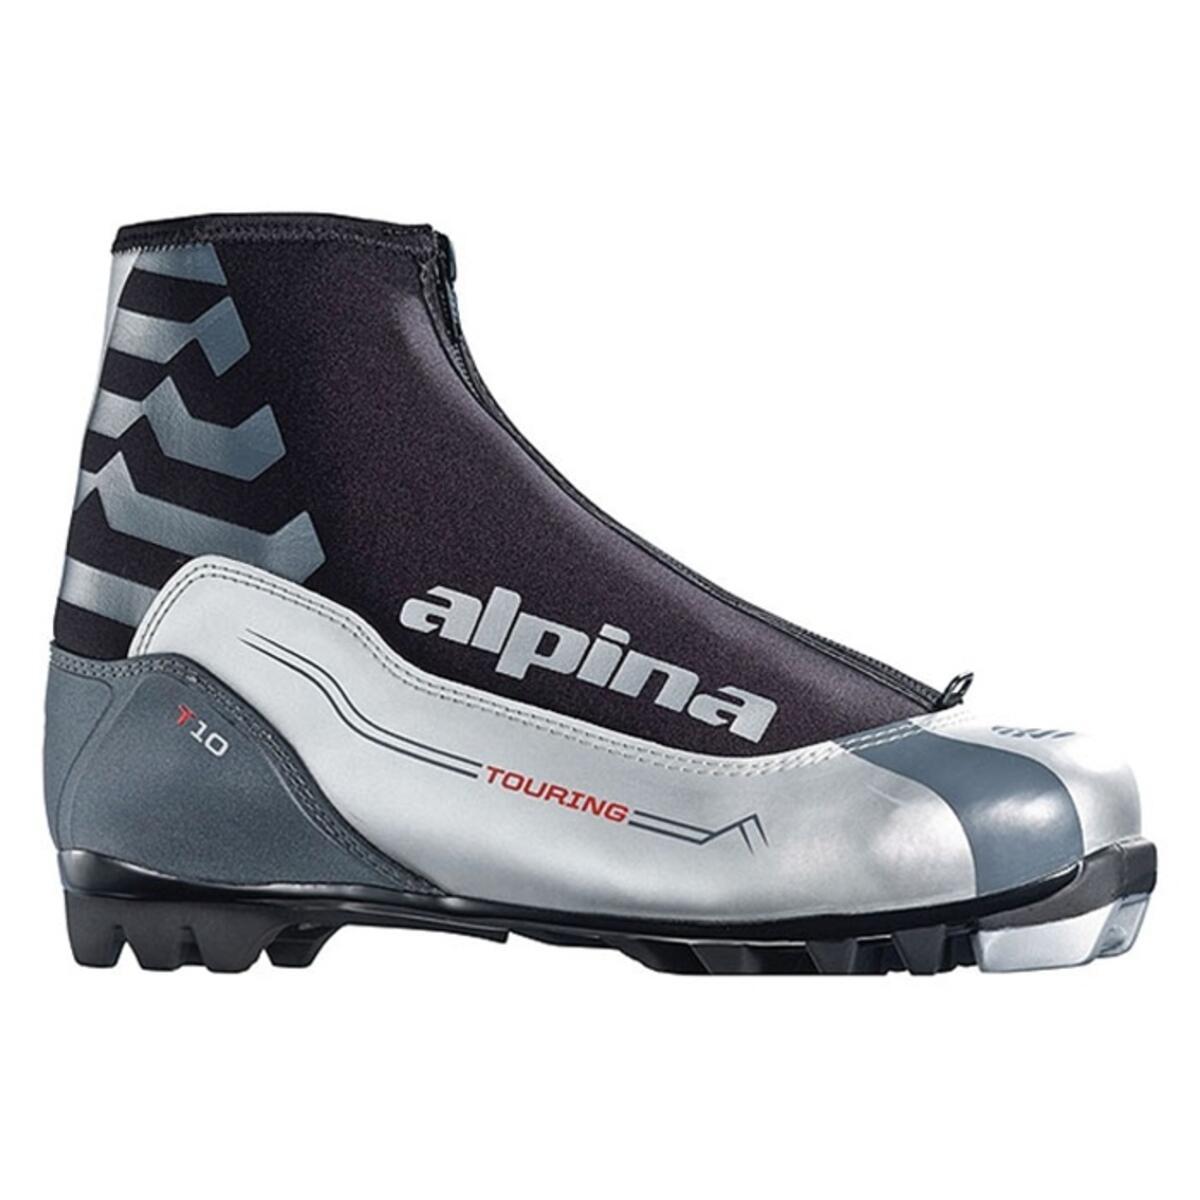 Alpina Men's T10 NNN Cross Country Ski Boots '12